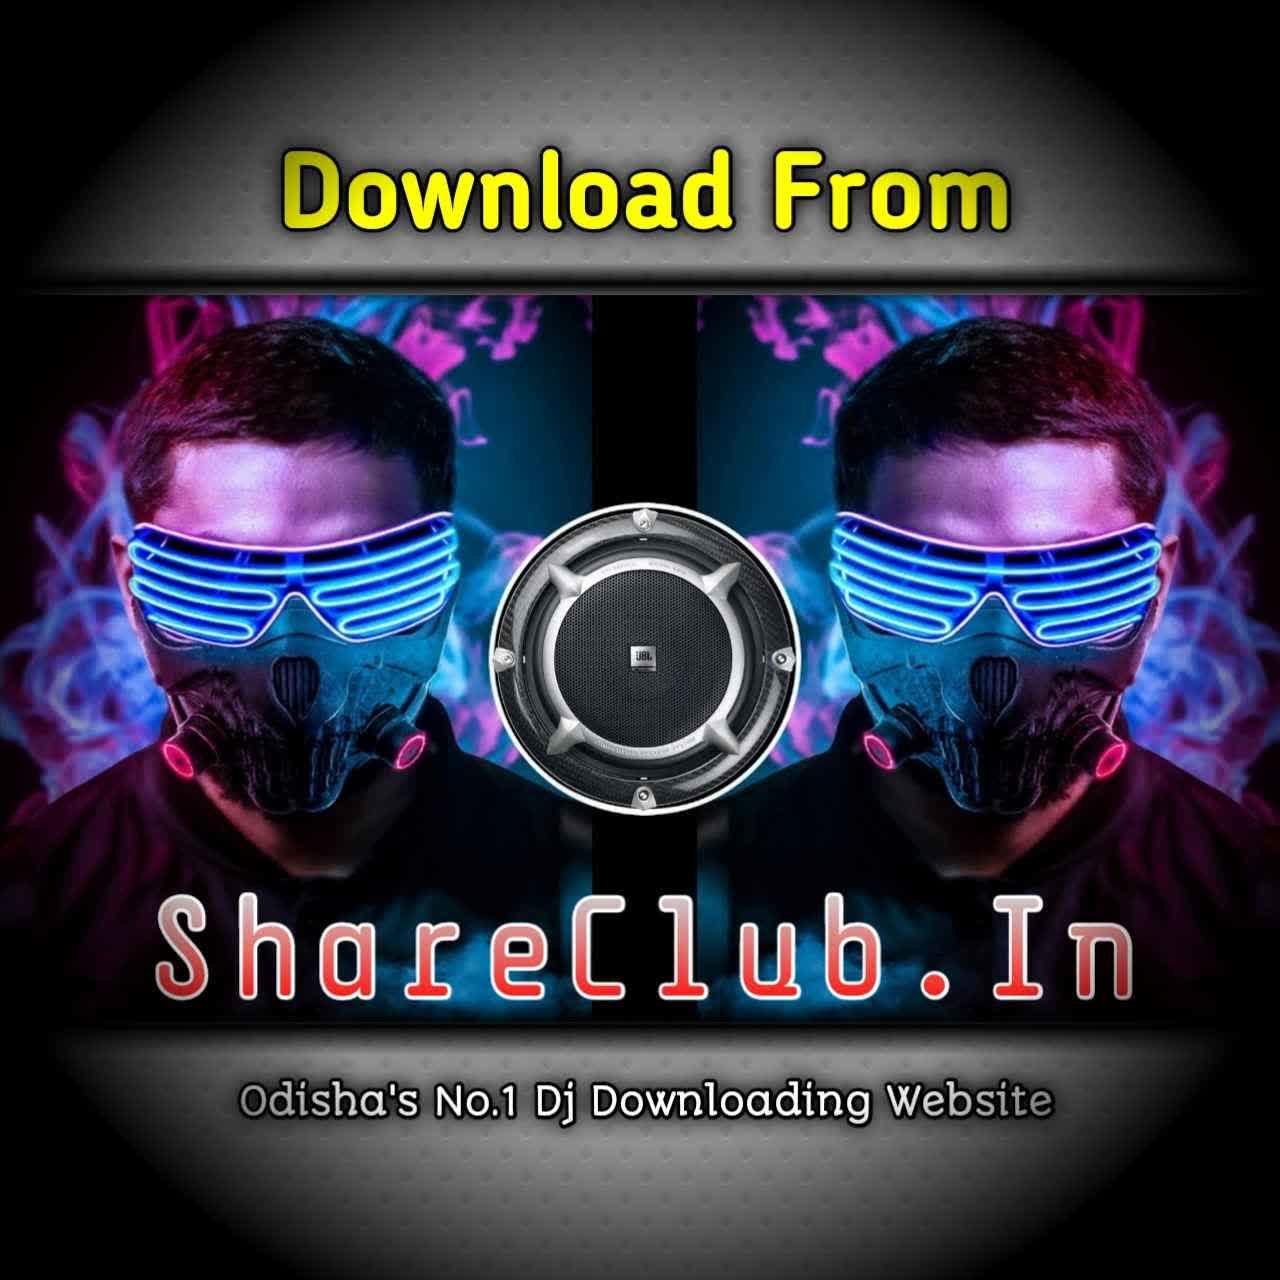 Toka Nachuchi Aji Mousam Re (Edm Dance Mix) Dj Binod Remix